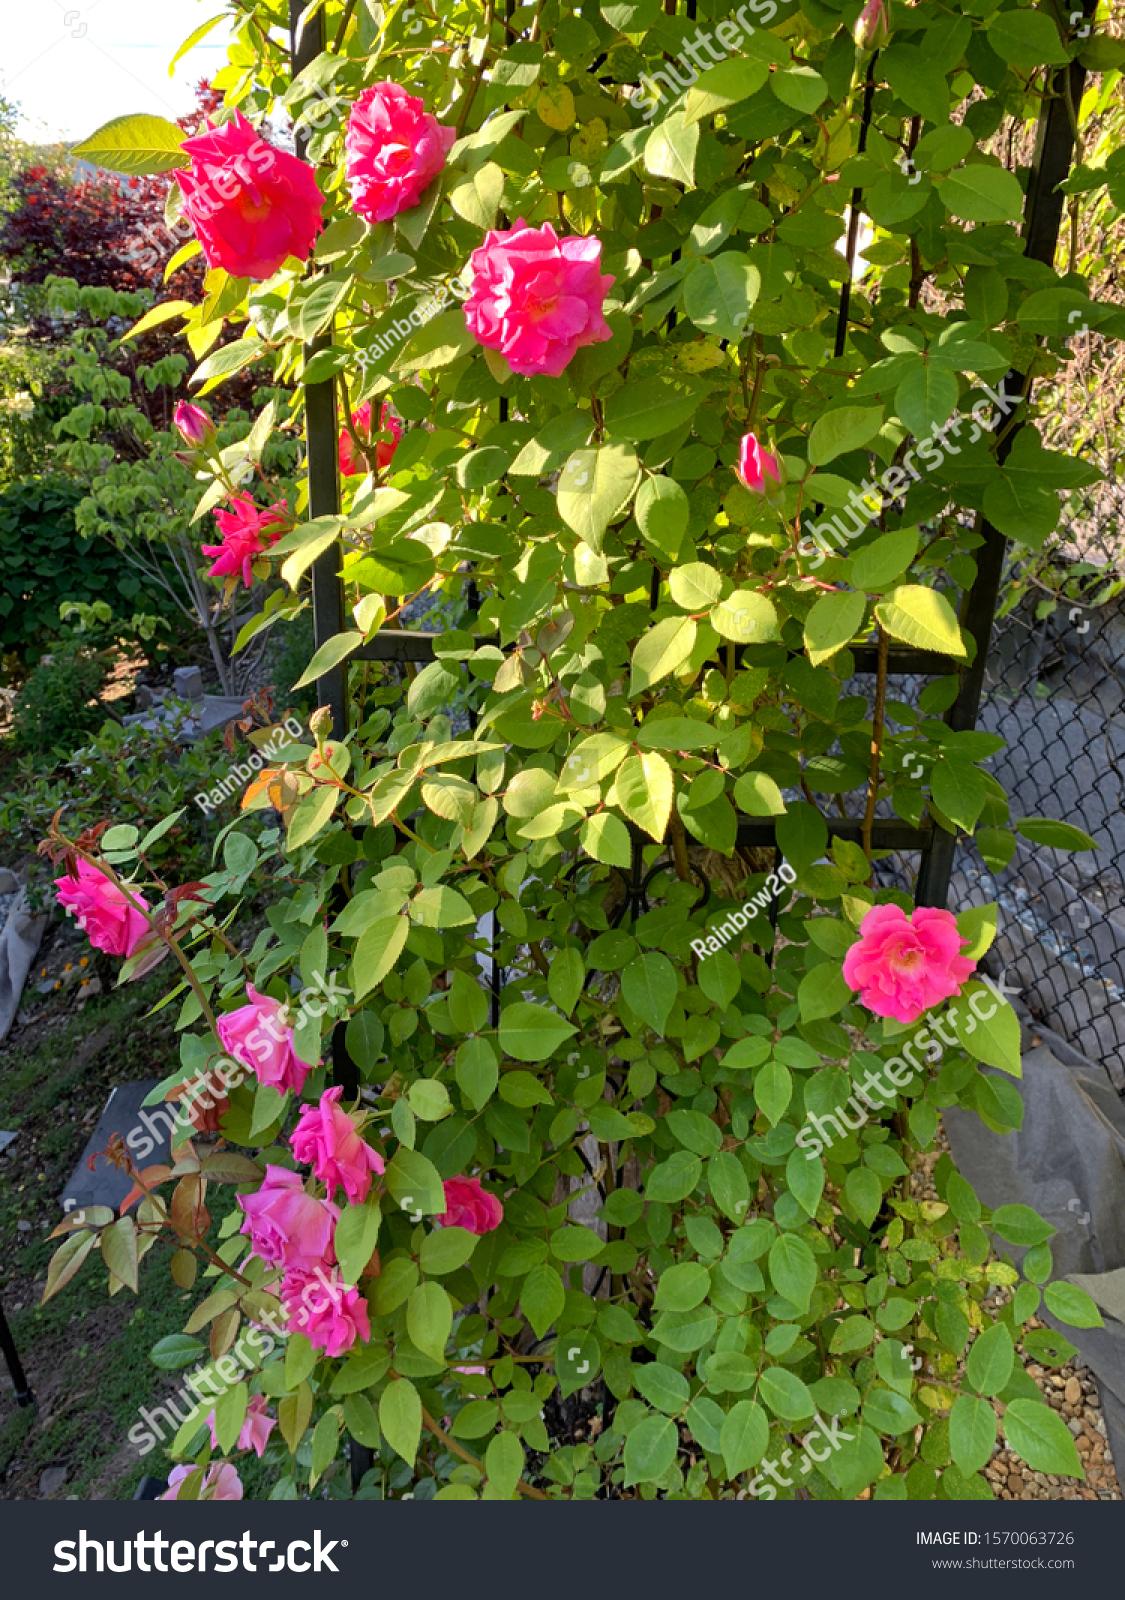 Zephirine Drouhin Climbing Rose zephirine drouhin images, stock photos & vectors   shutterstock